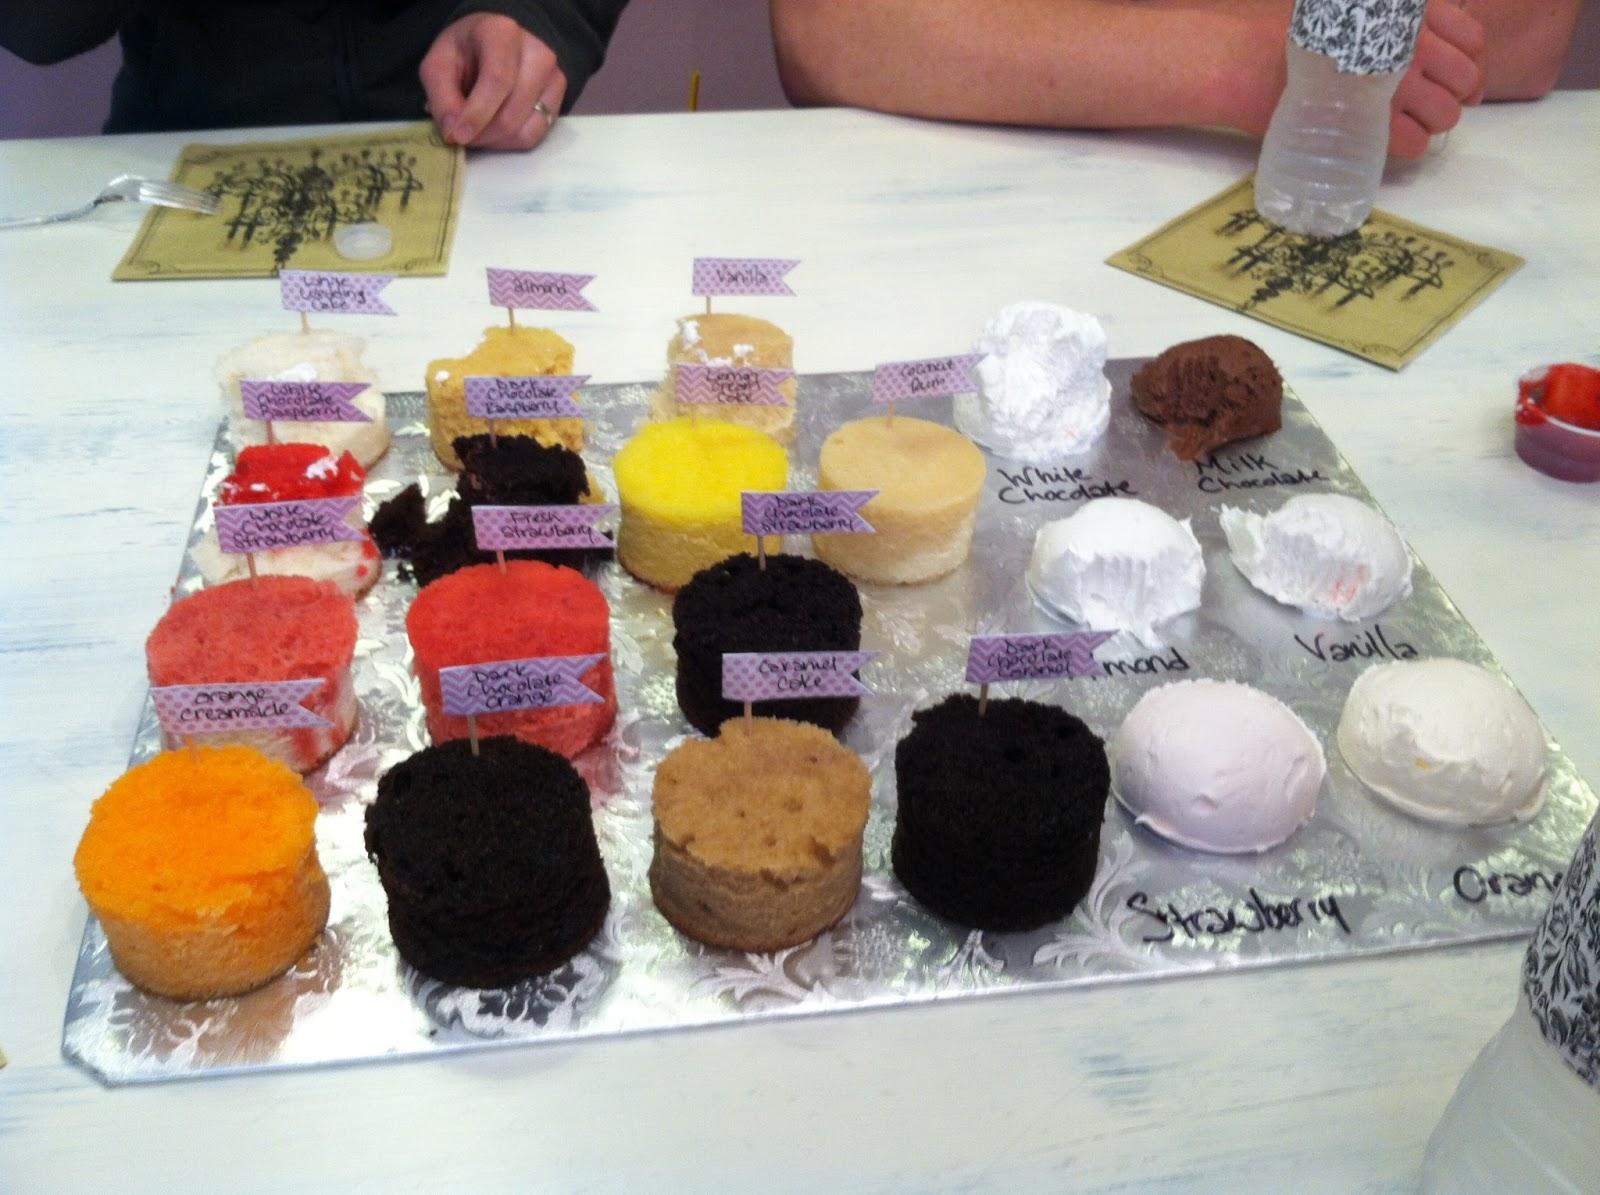 wedding cake types of frosting wedding cake icing types. Black Bedroom Furniture Sets. Home Design Ideas